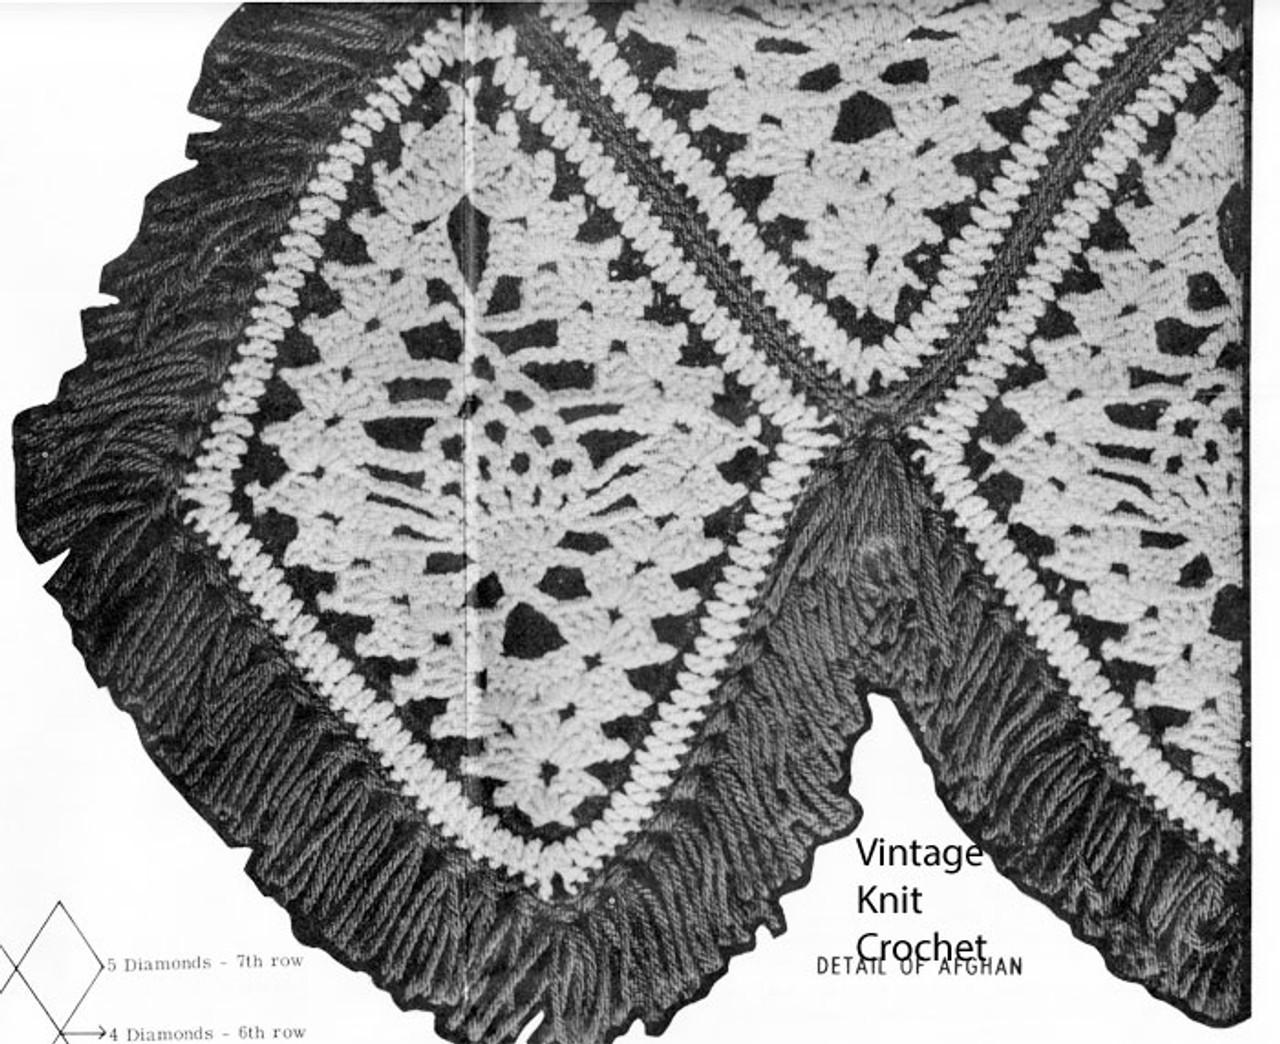 Crochet Diamond throw, with pineapples, pattern Design 7160